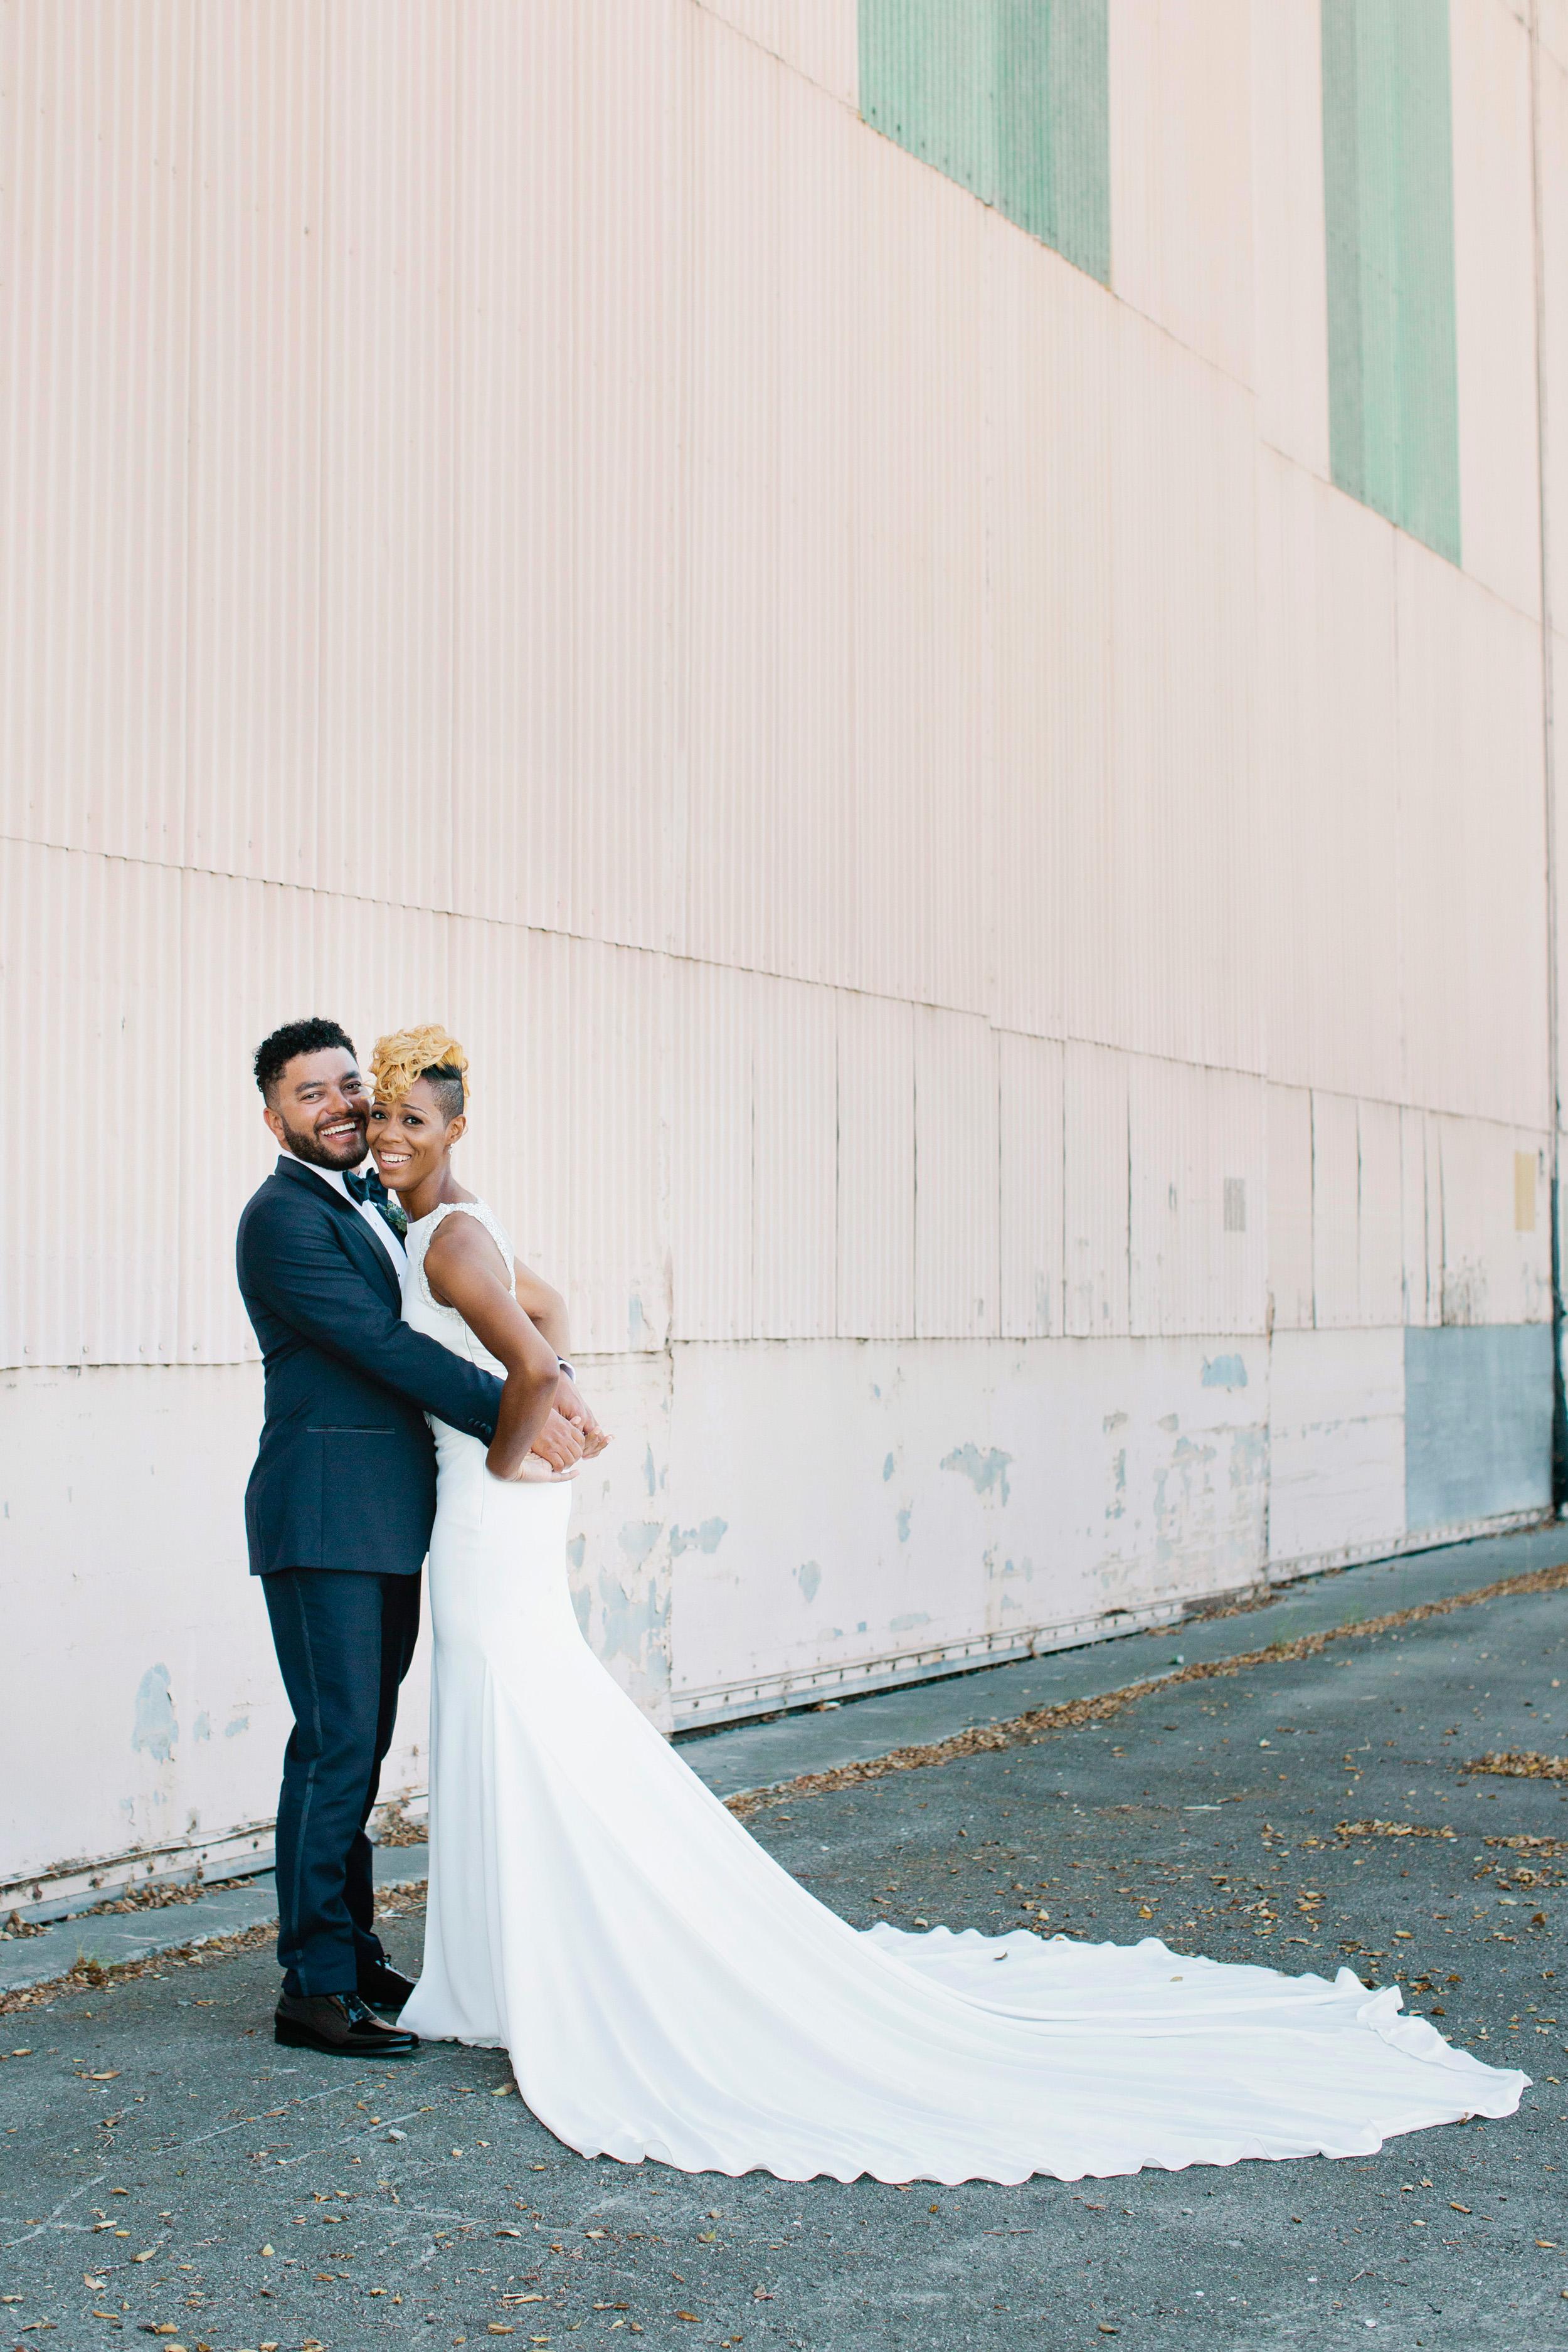 Alameda-Rockwall-Winery-Wedding-017.JPG